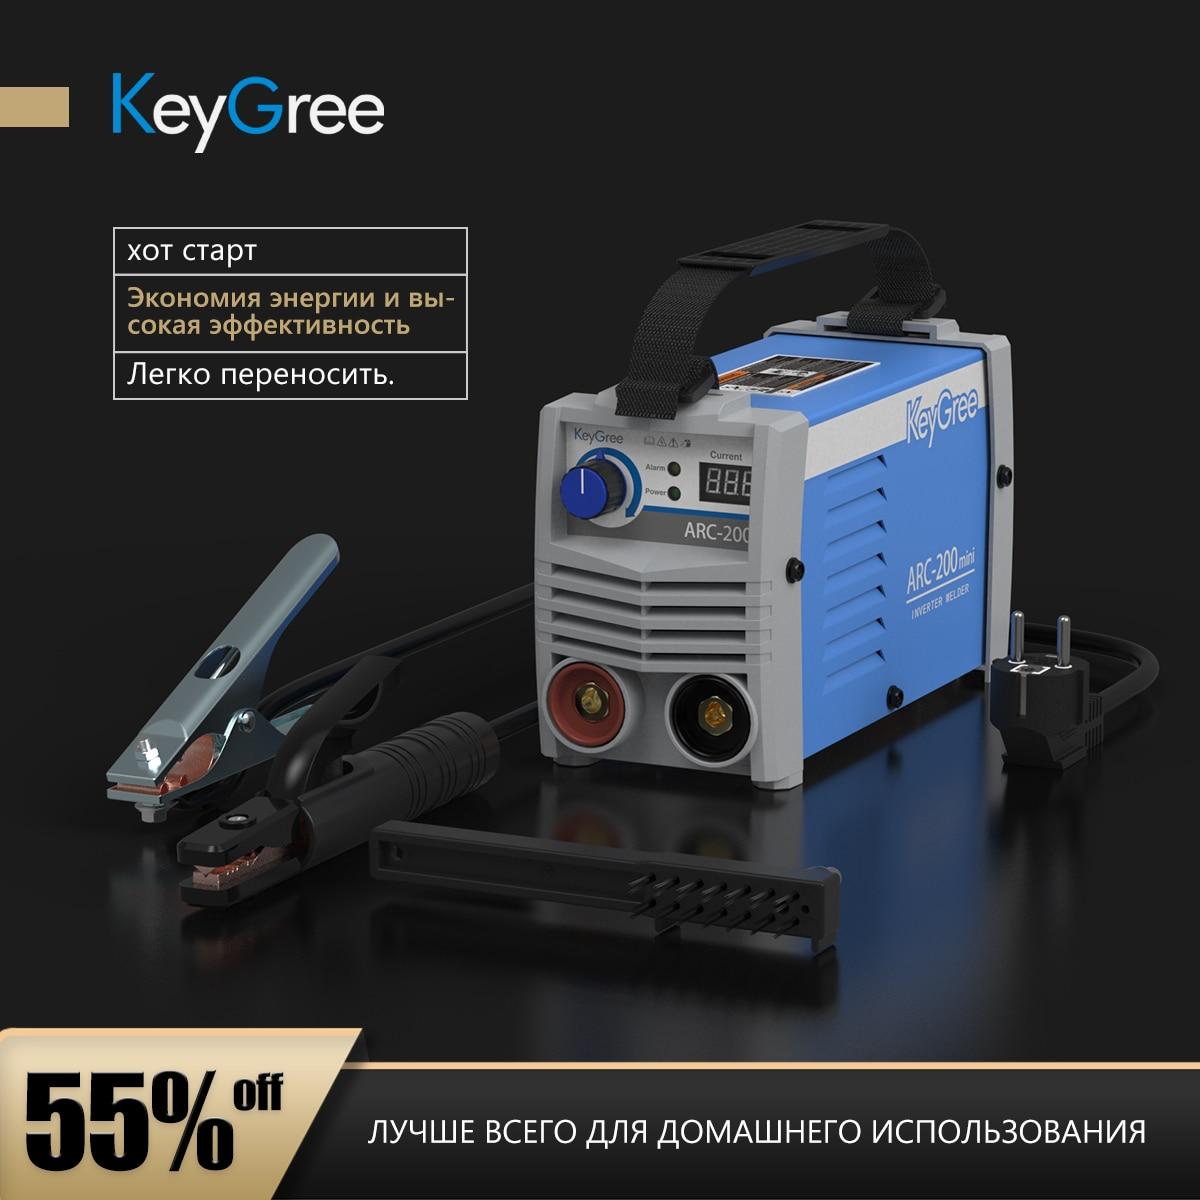 KeyGree Euro Quality Mini ARC Welding Machine Single Phase 220V Inverter MMA Portable Welder ARC200/220/240 Mini Welding Machine